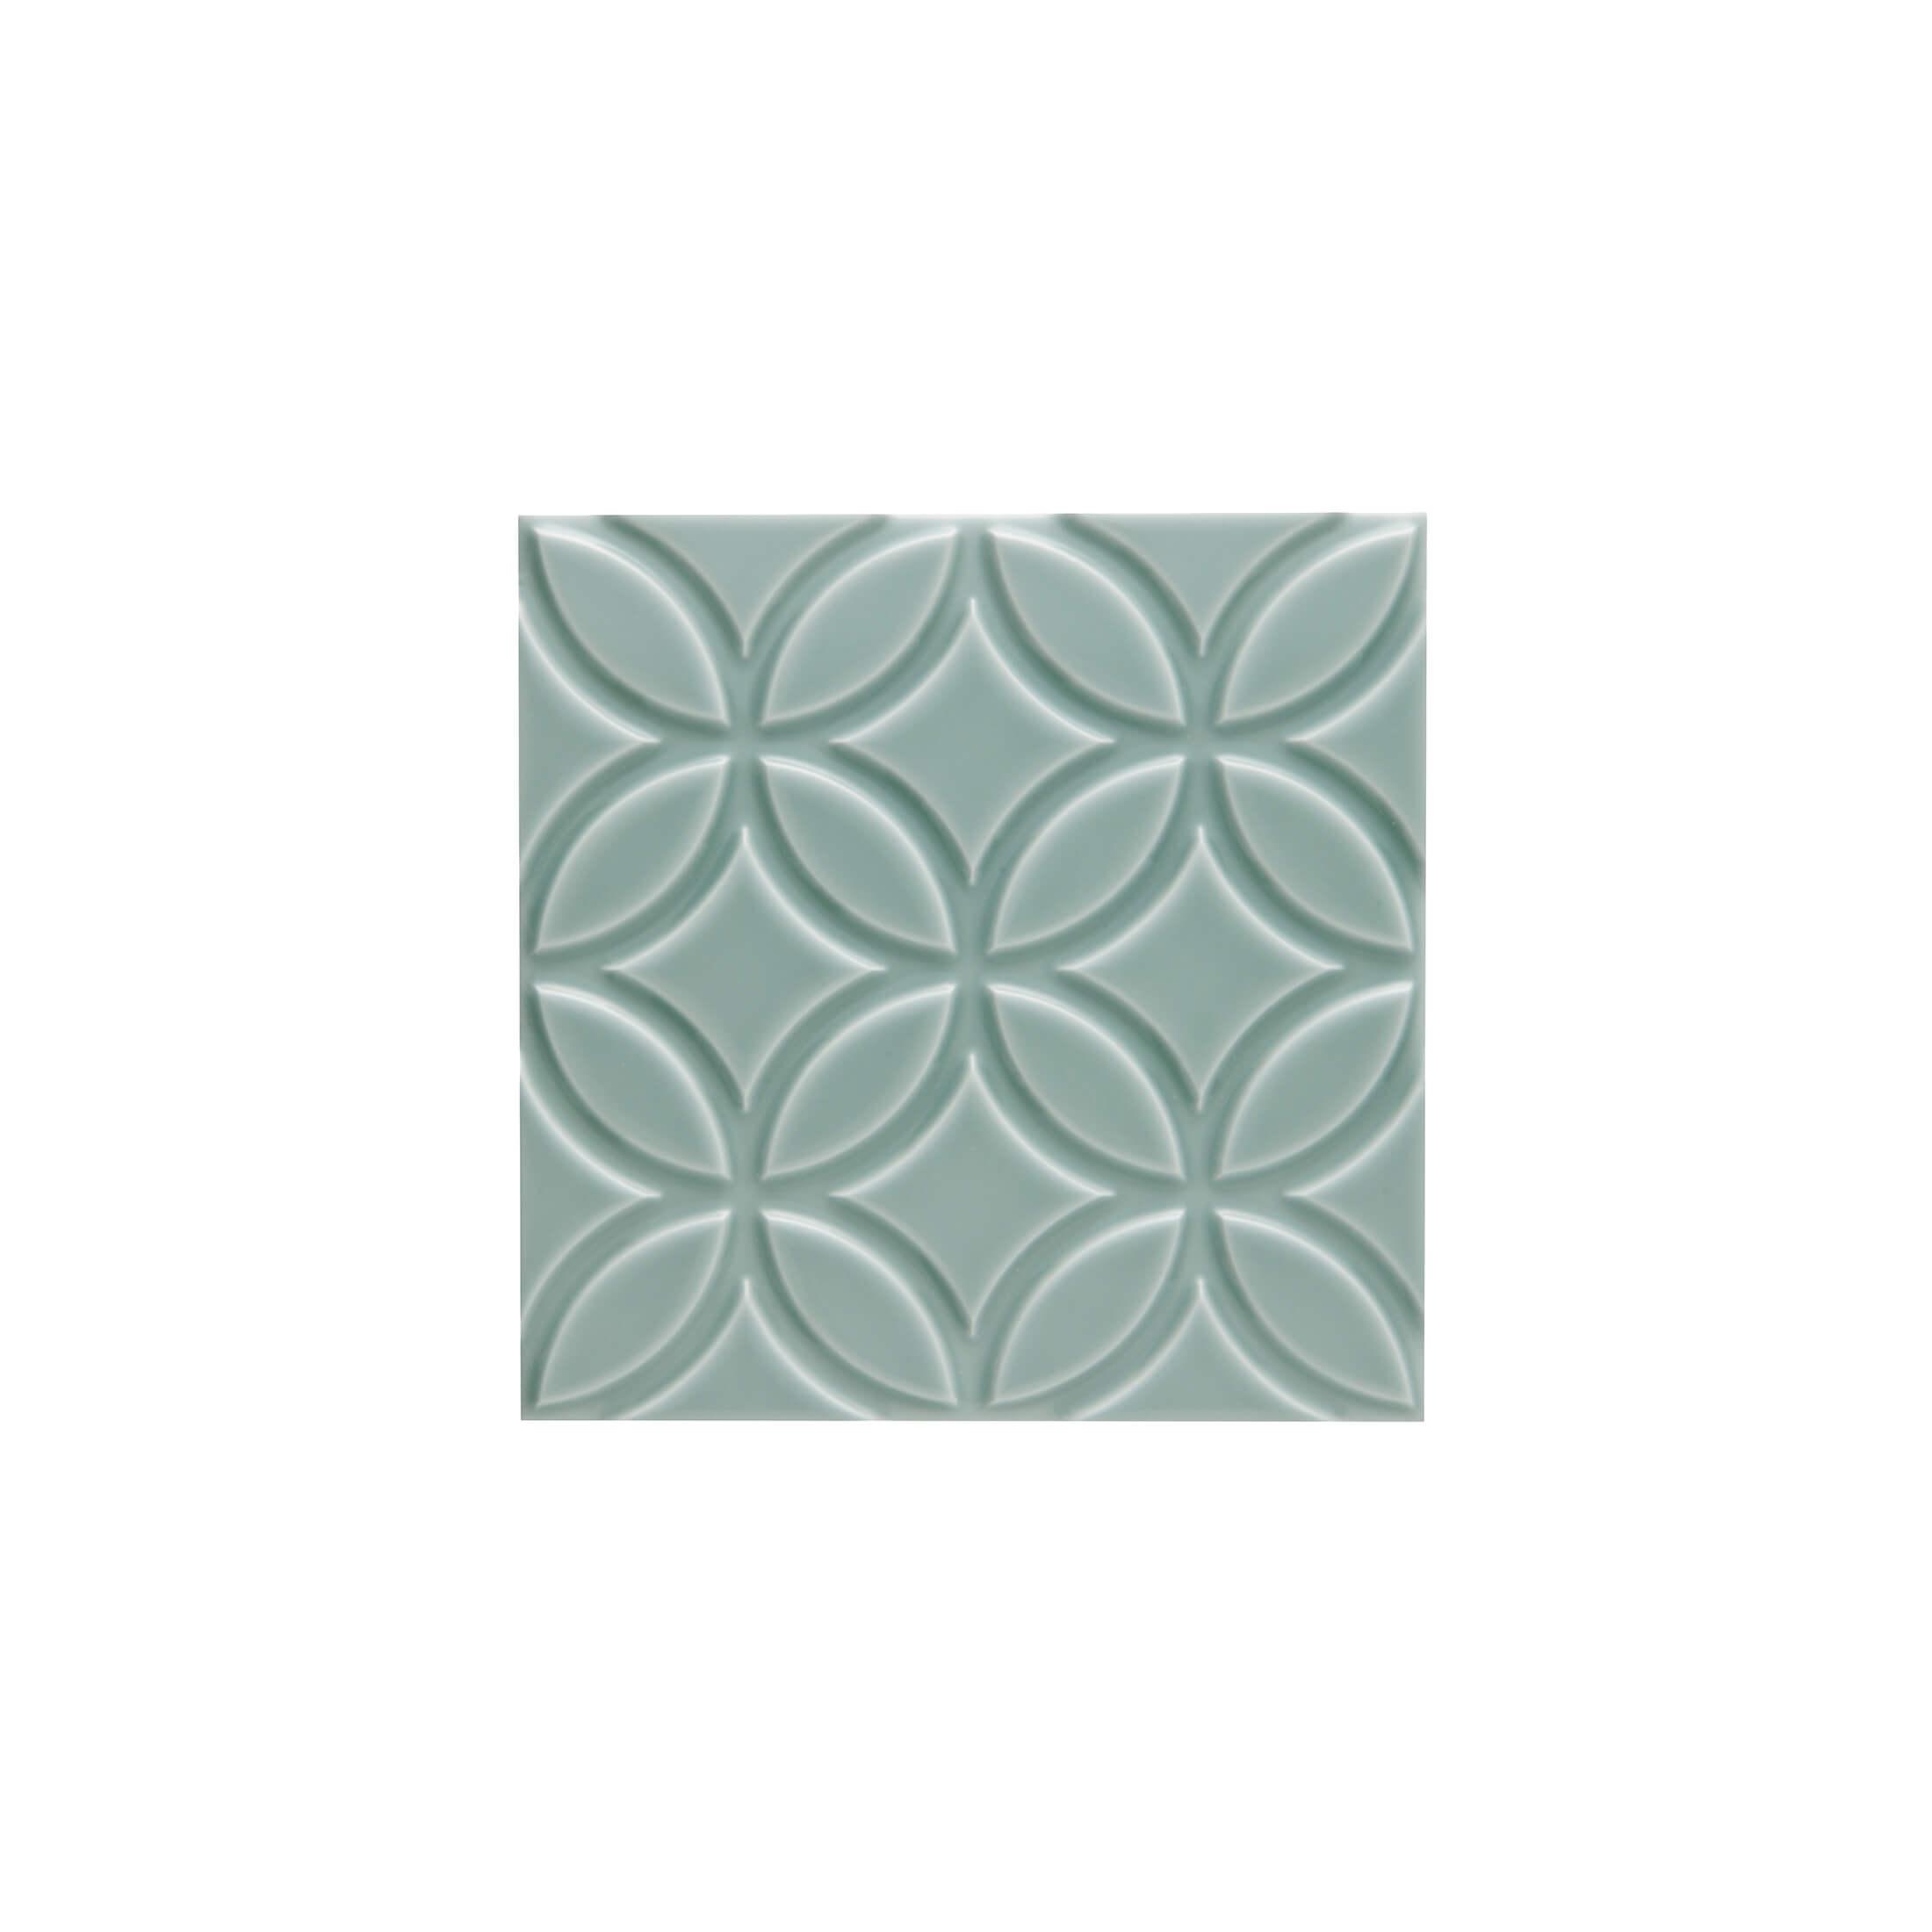 ADNE4147 - LISO BOTANICAL - 15 cm X 15 cm